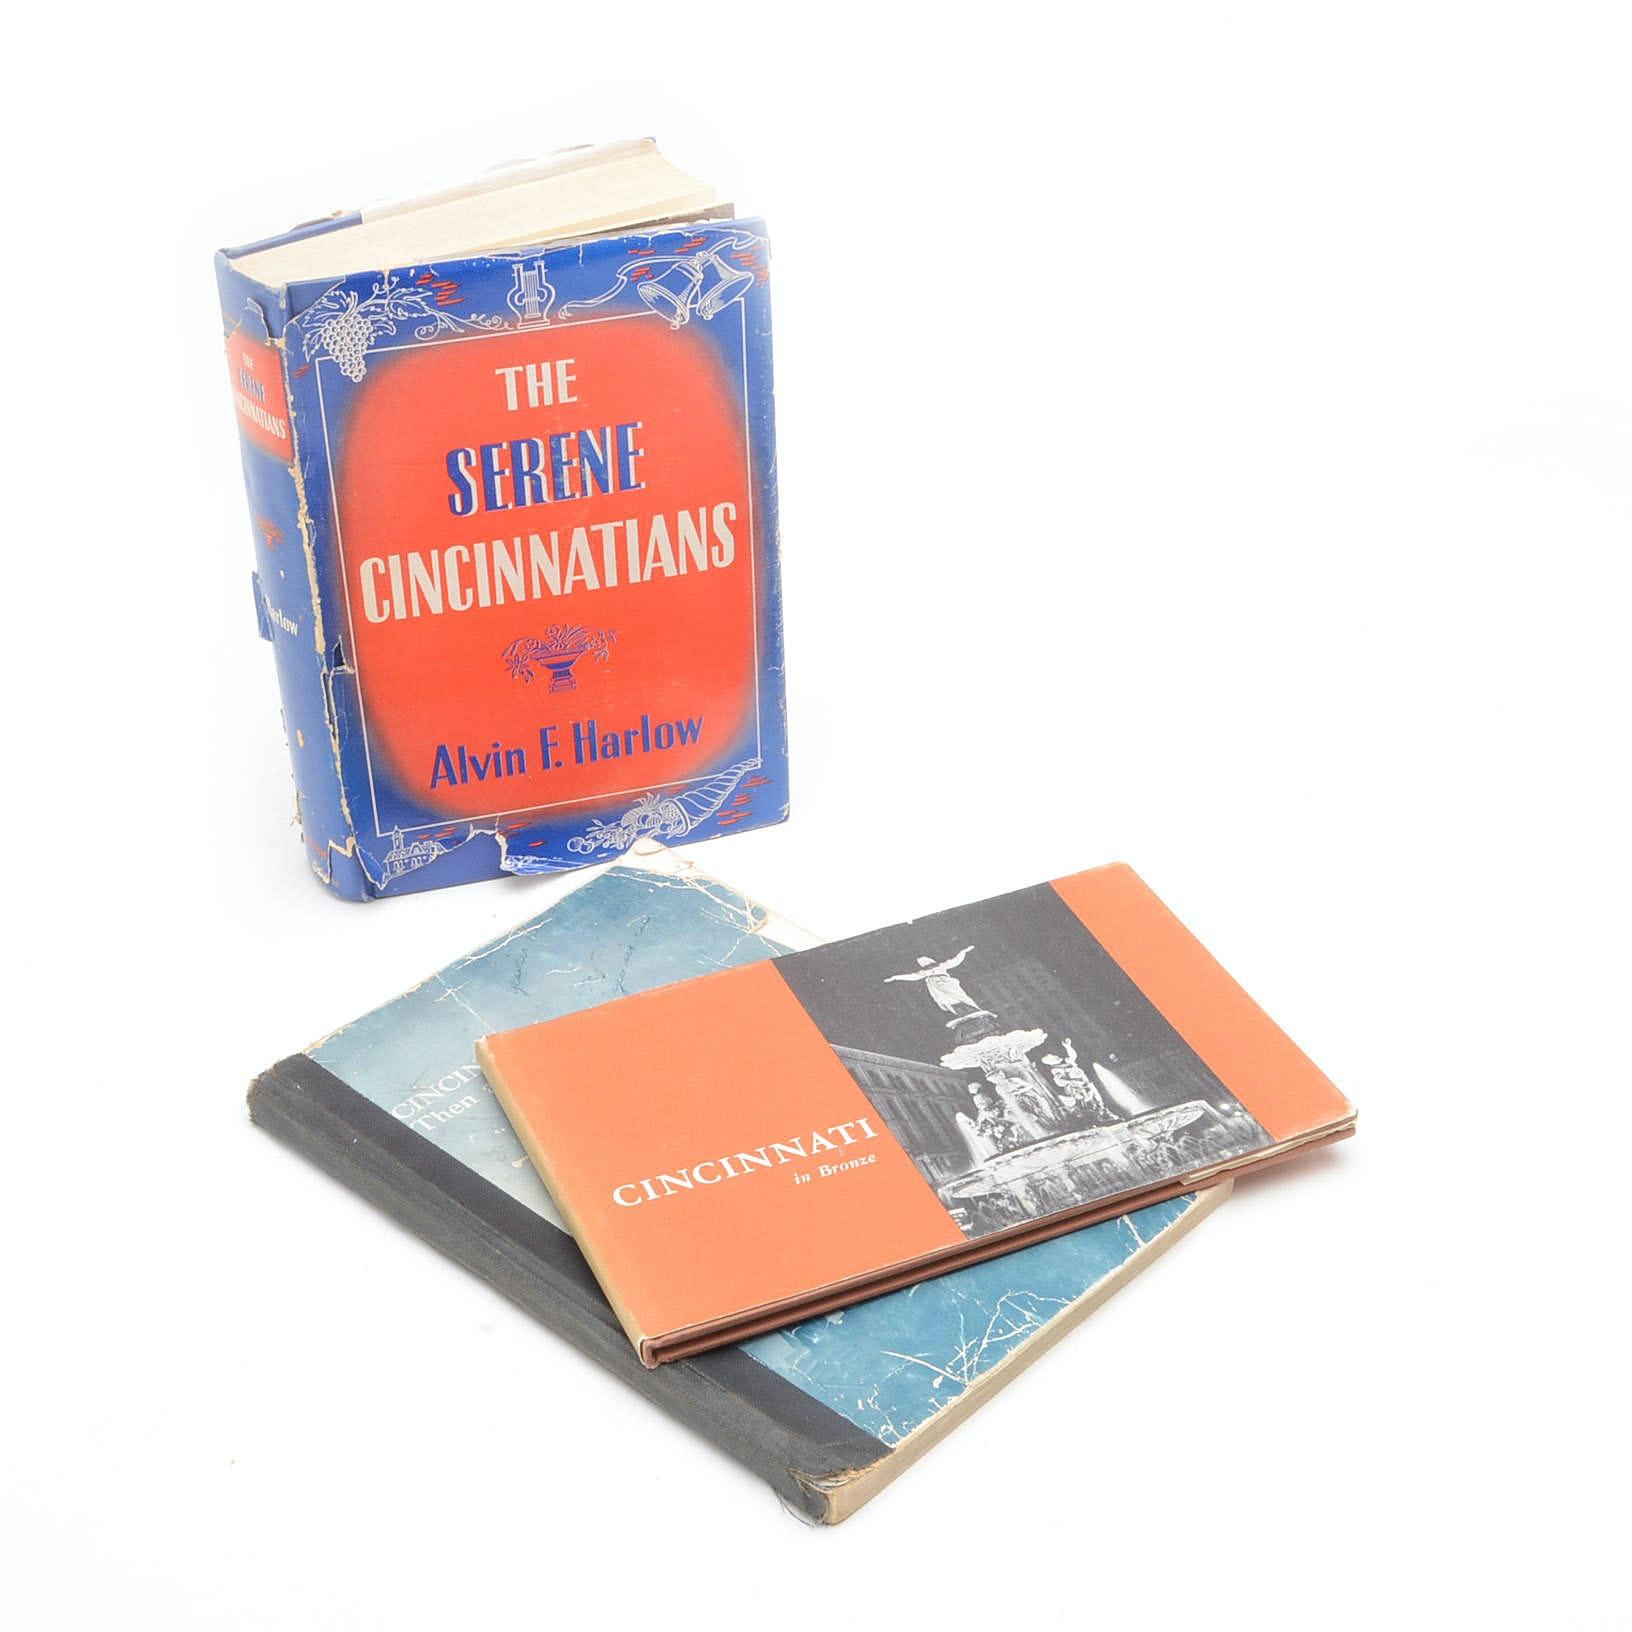 Collection of Vintage Books on Cincinnati